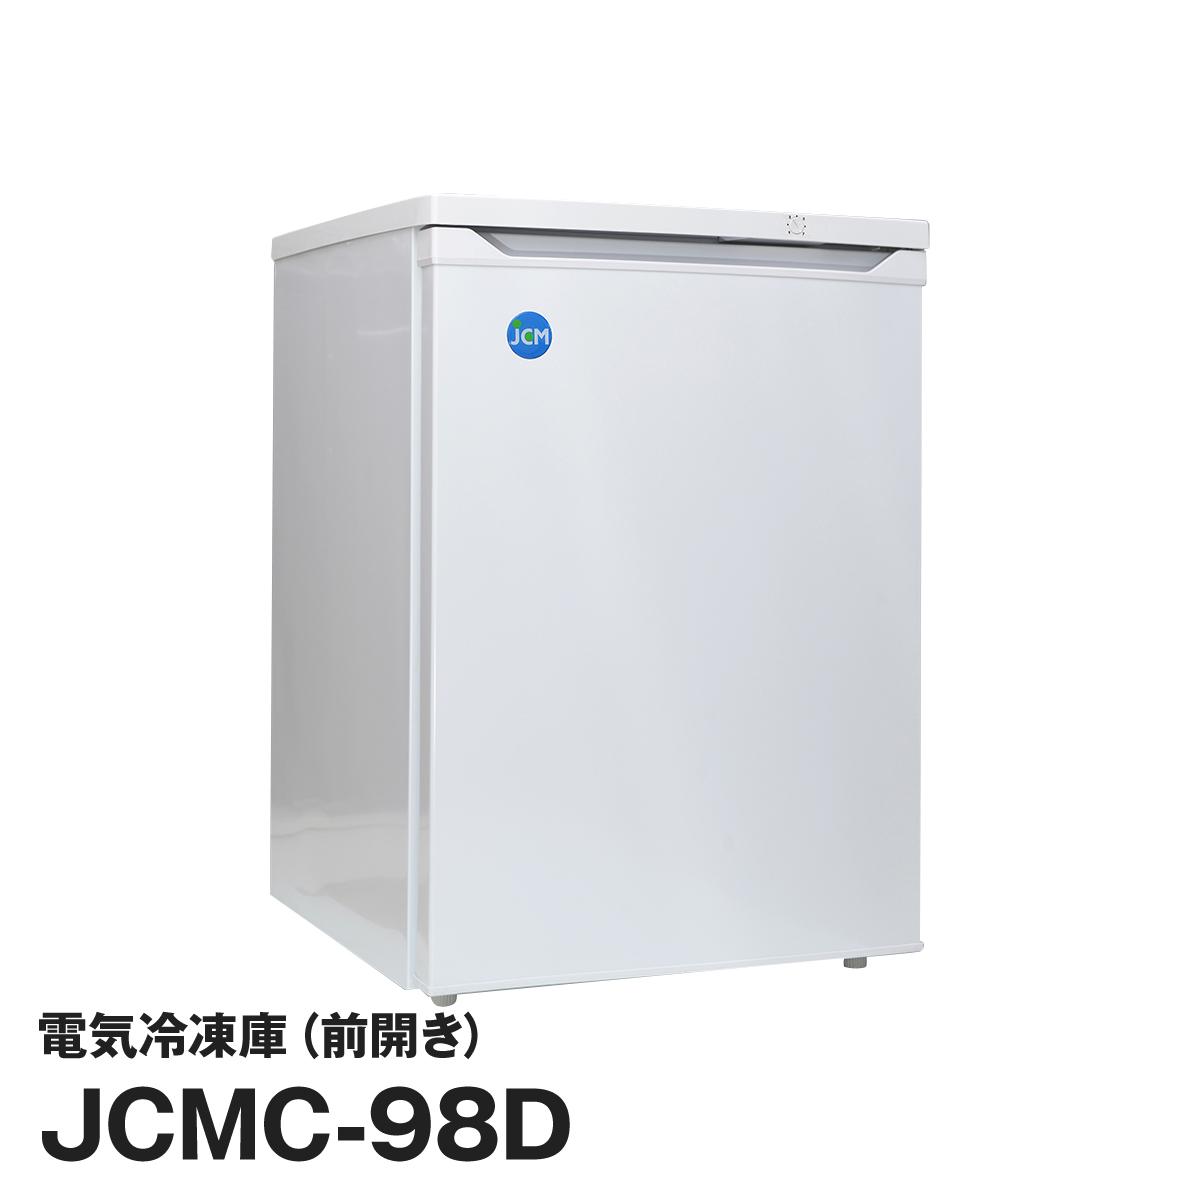 JCM社製 業務用 保冷庫 冷凍庫 98L 電気冷凍庫 JCMC-98D 新品